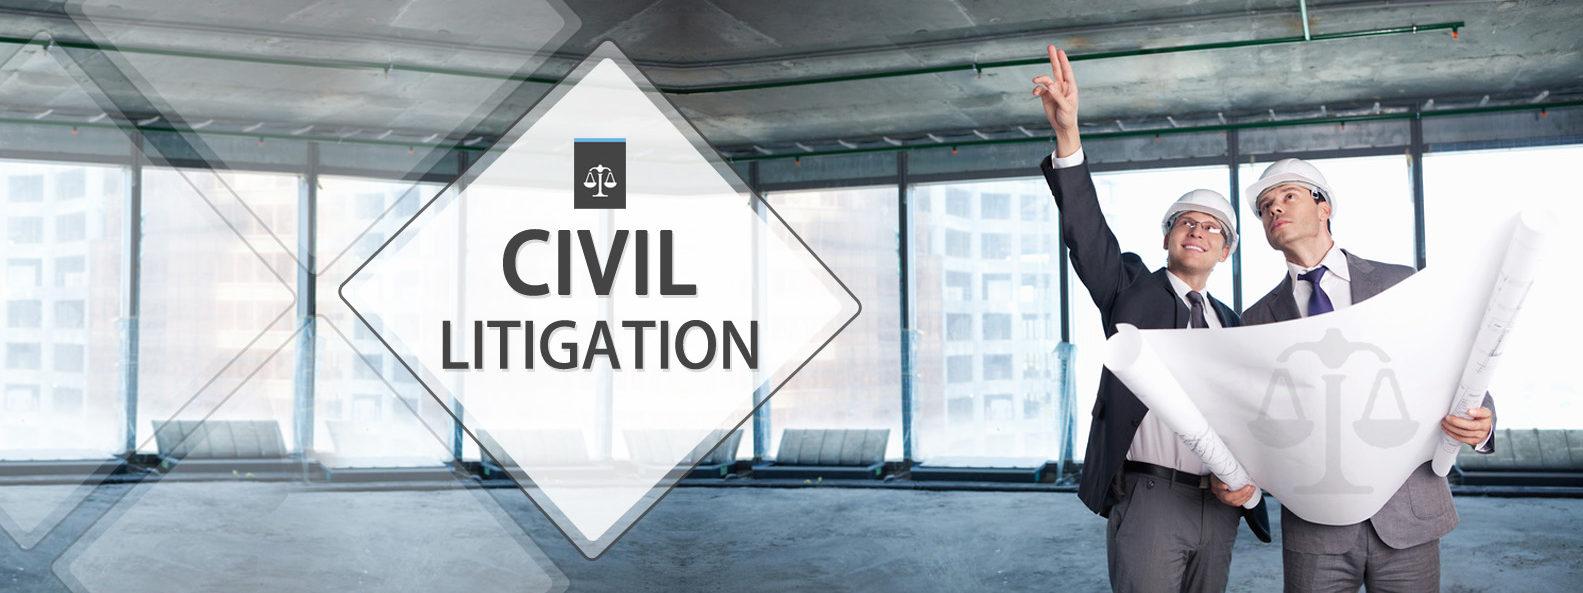 civil-litigation-Ambwani